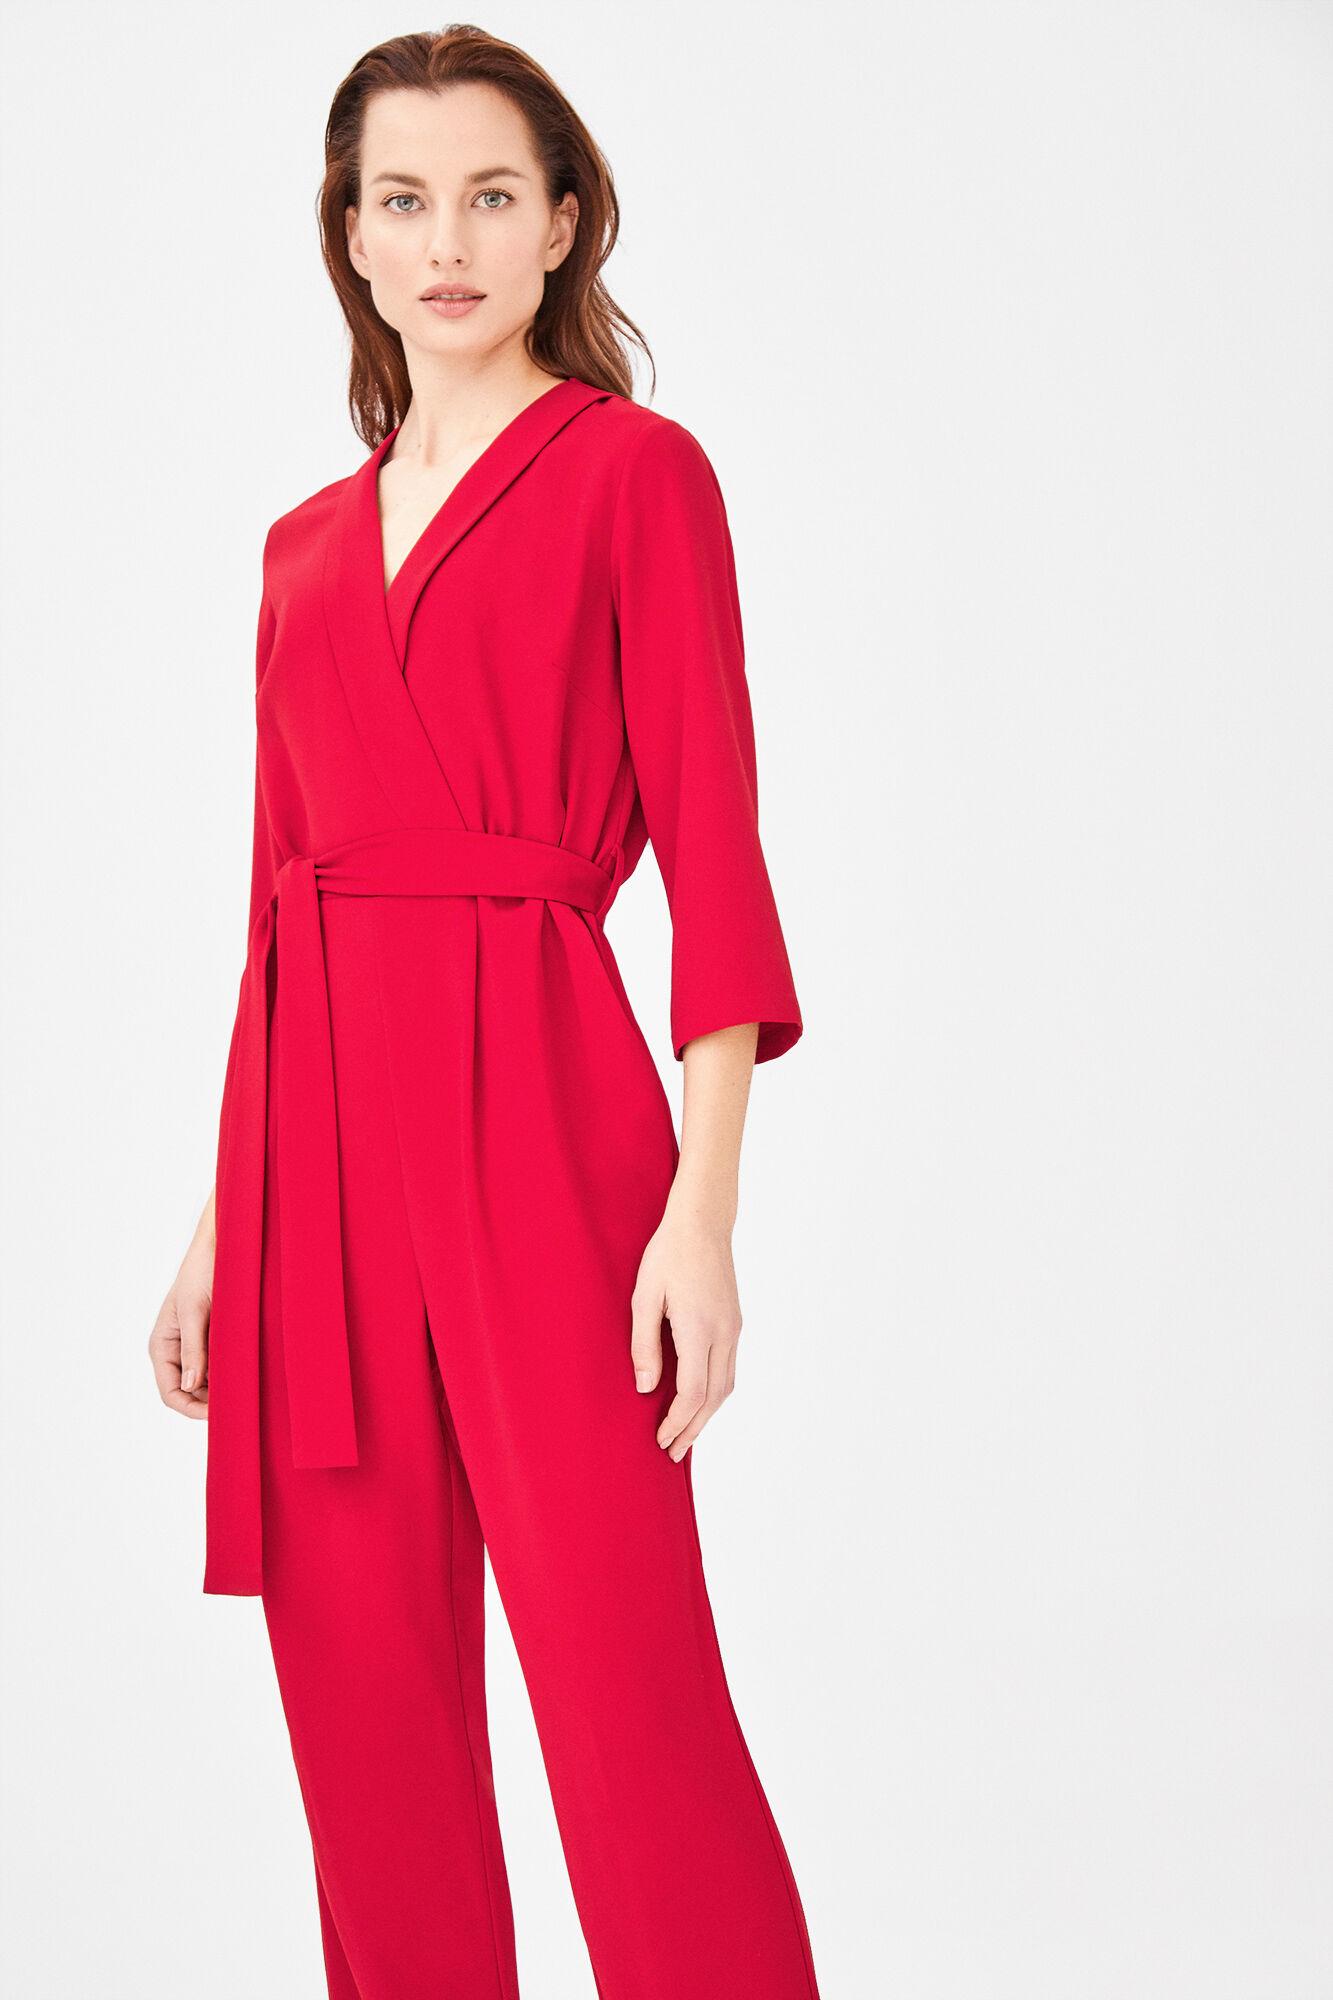 Desigual damen casual kleid vest_evase rojos grises